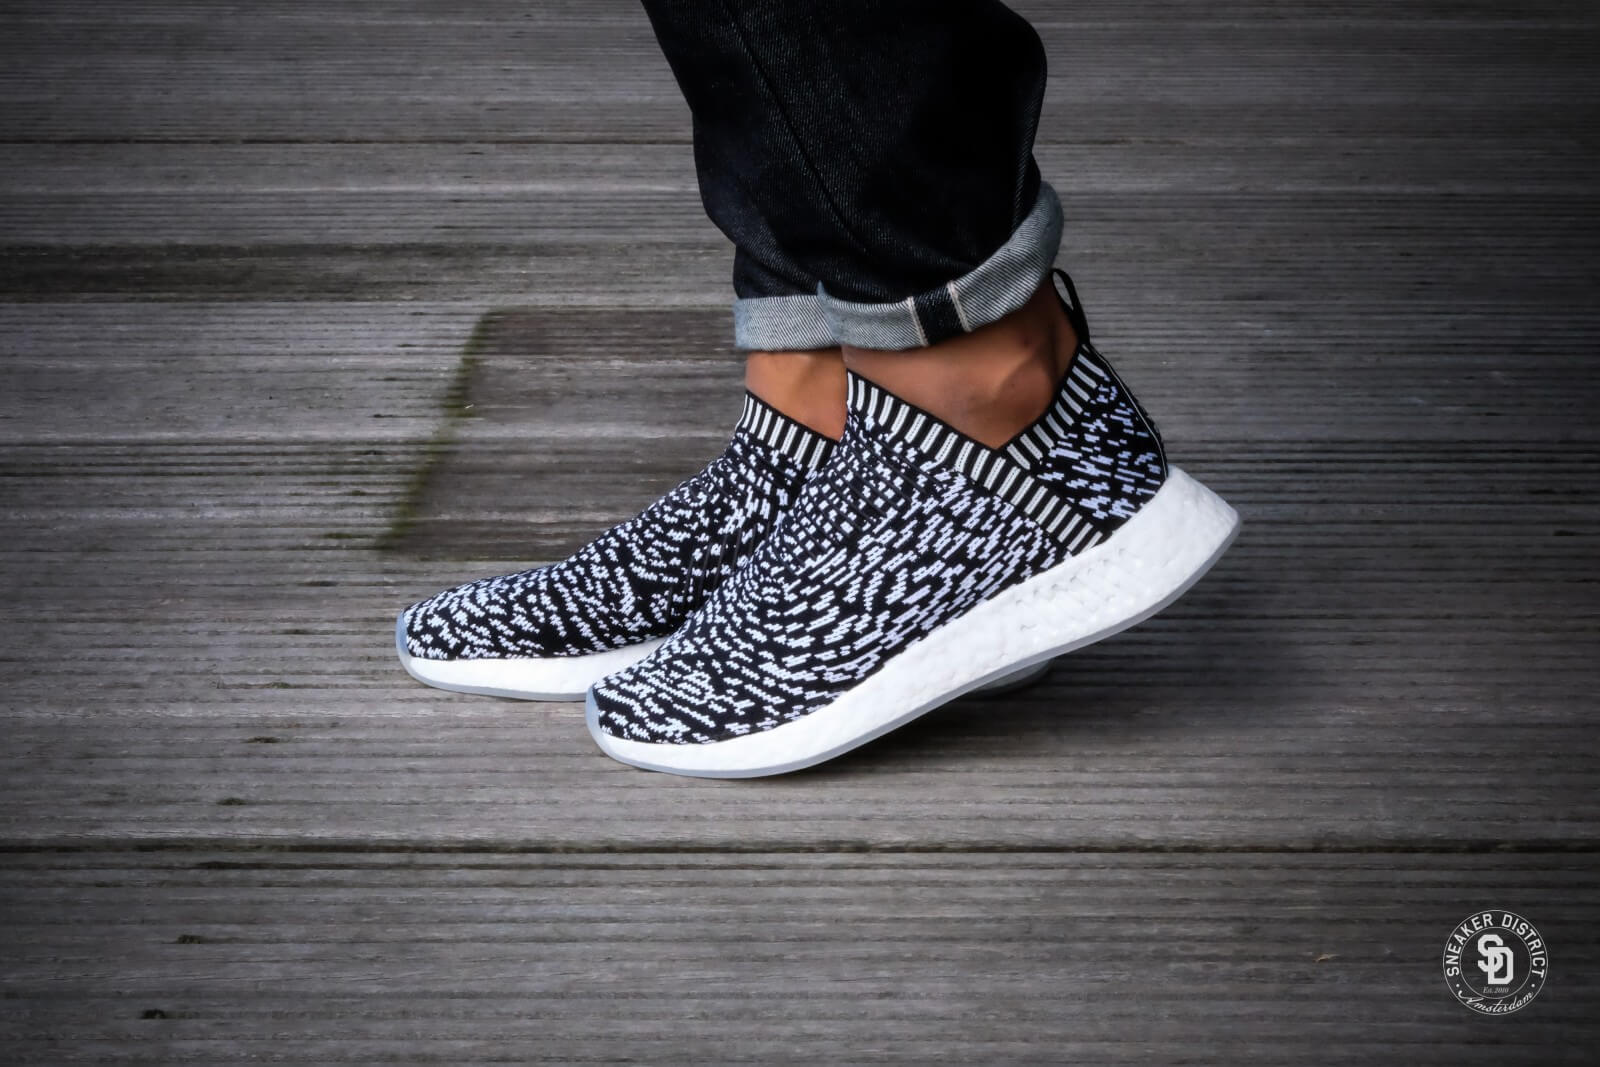 Adidas NMD CS2 City Sock Primeknit Zebra Sashiko Pack BY3012